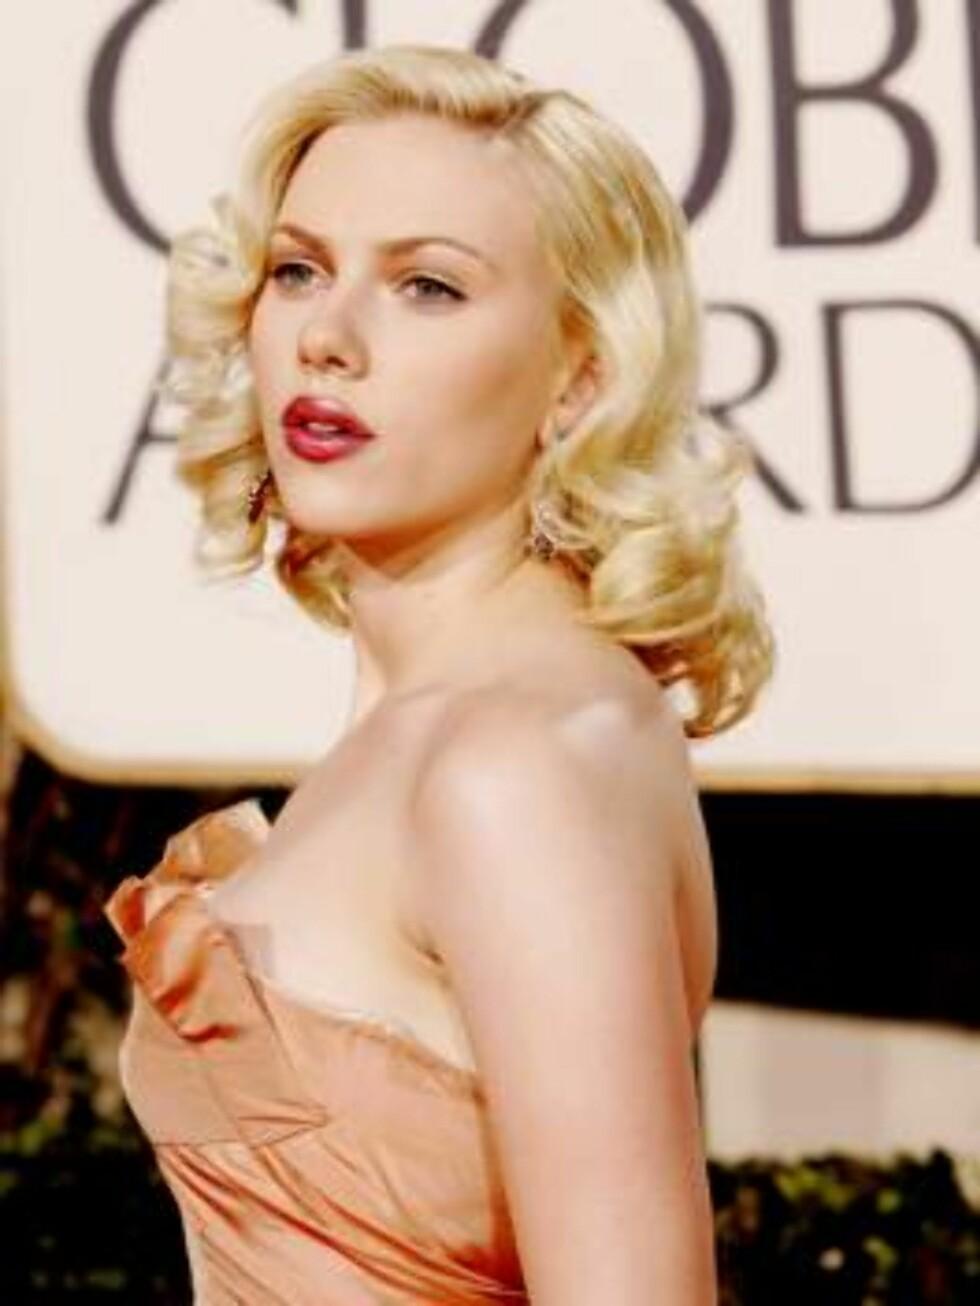 Scarlett Johansson arrives for the 62nd Annual Golden Globe Awards on Sunday, Jan. 16, 2005, in Beverly Hills, Calif. (AP Photo/Kevork Djansezian) Foto: AP/Scanpix